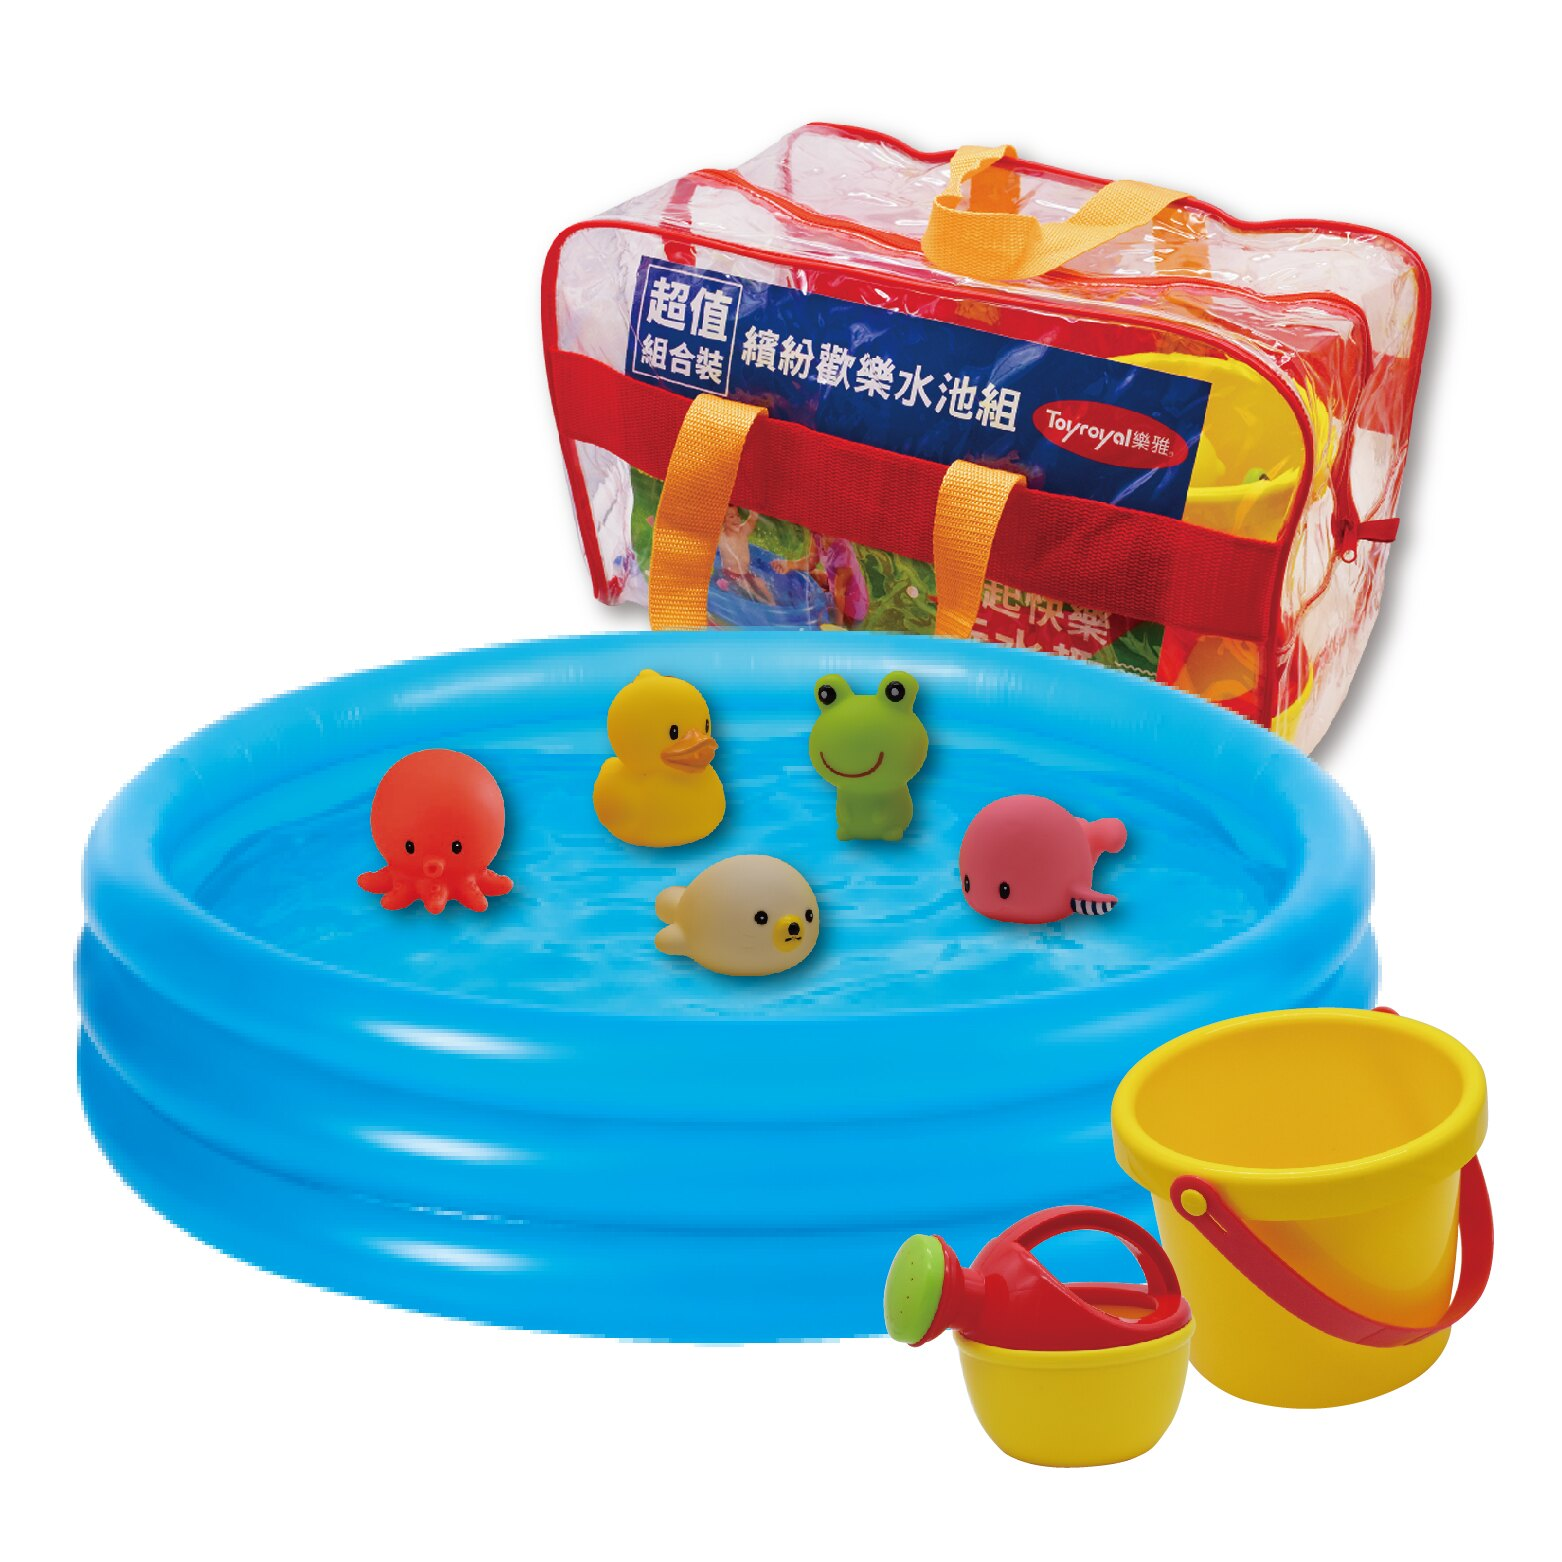 Toyroyal樂雅│歡樂戲水泳池組  夏日兒童露營玩具(3歲以上)